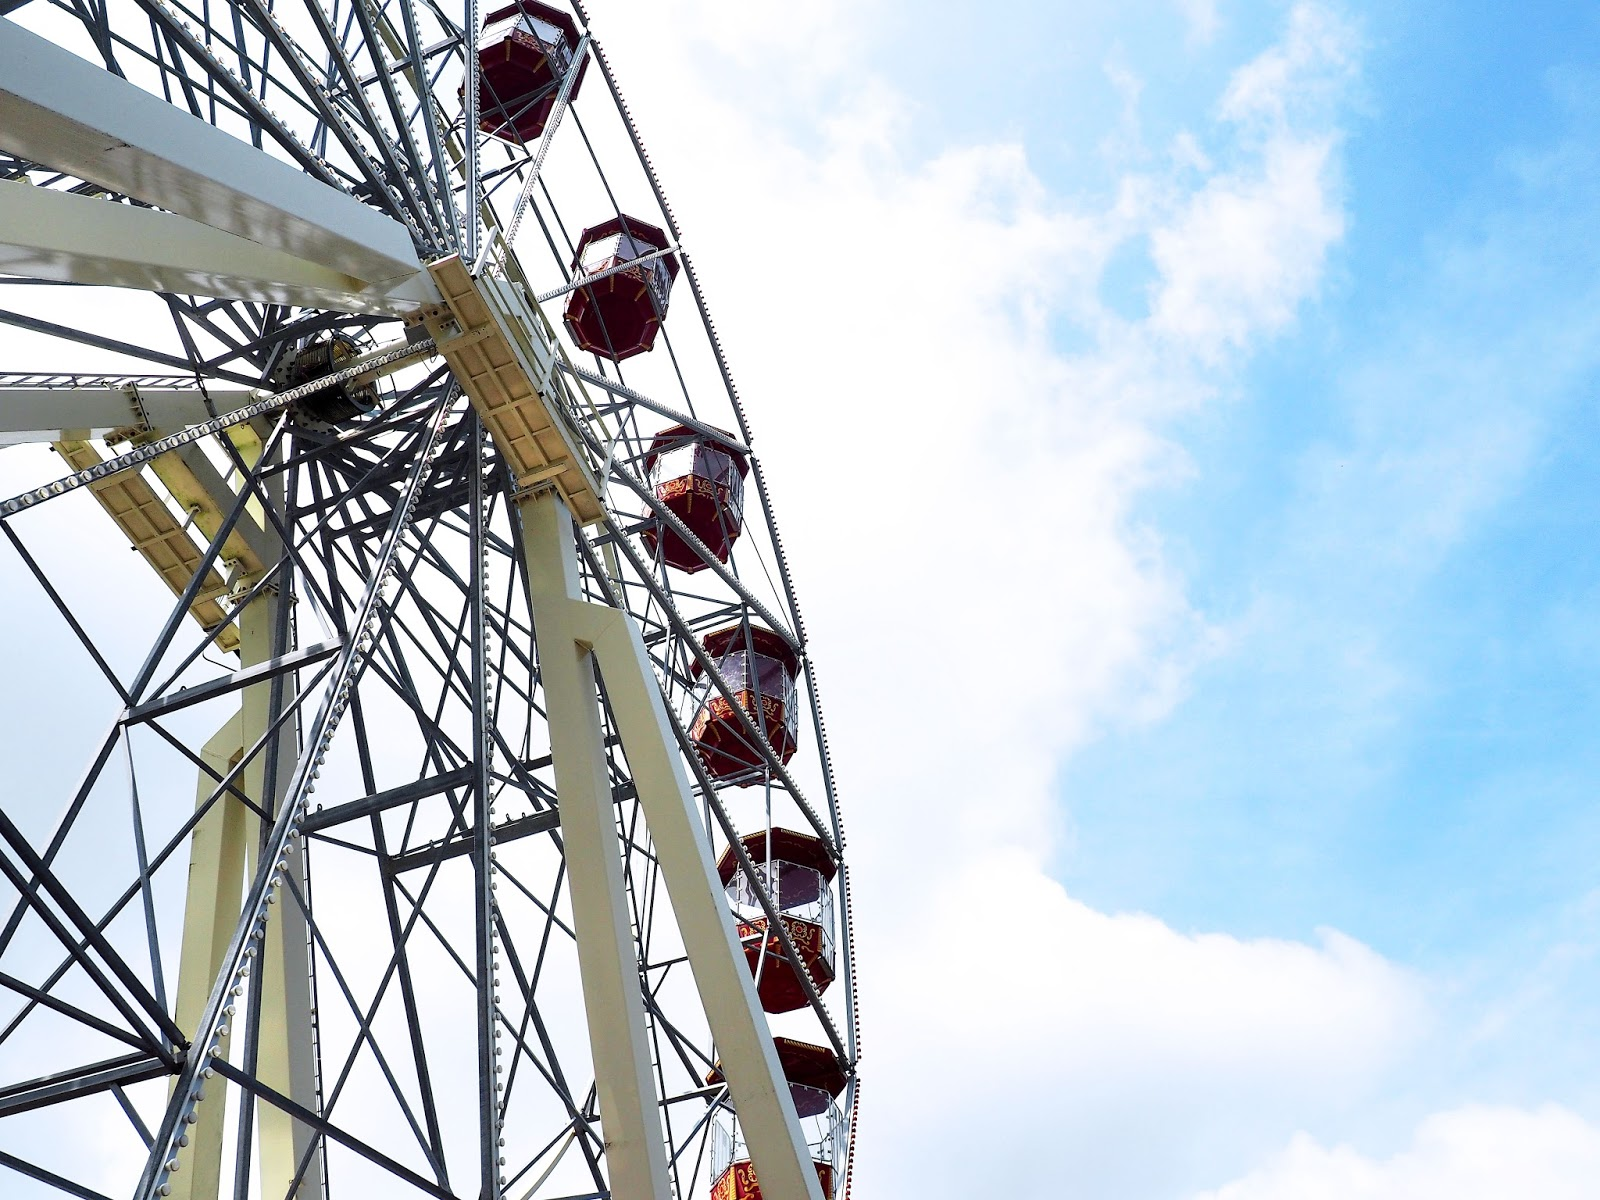 Folly Farm Adventure Park and Zoo Ferris Wheel